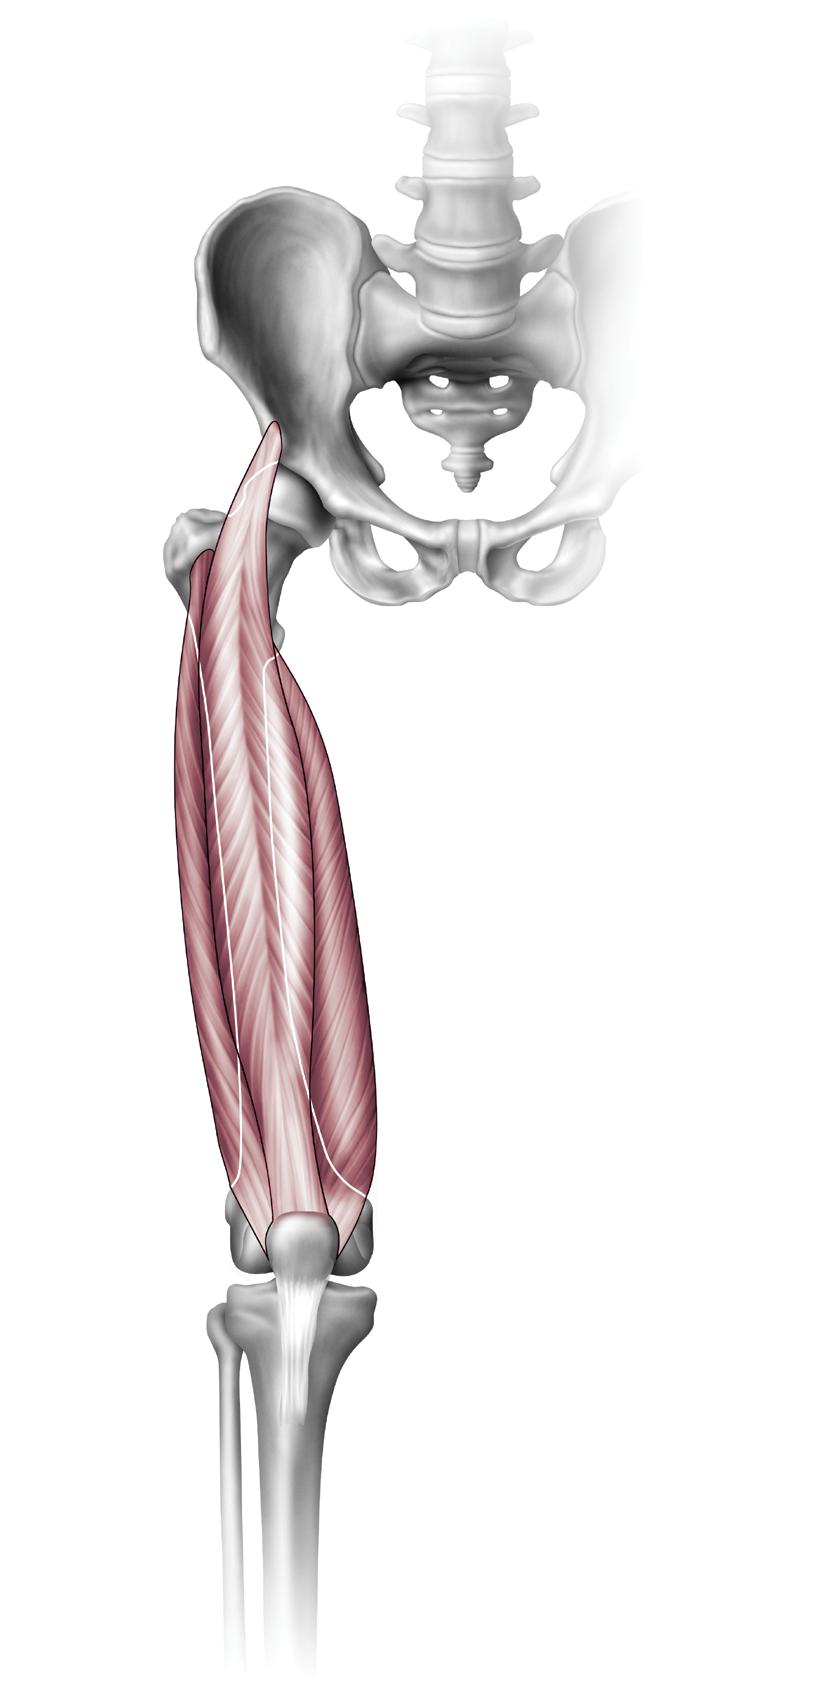 Anatomy Archives - Orthogate Press